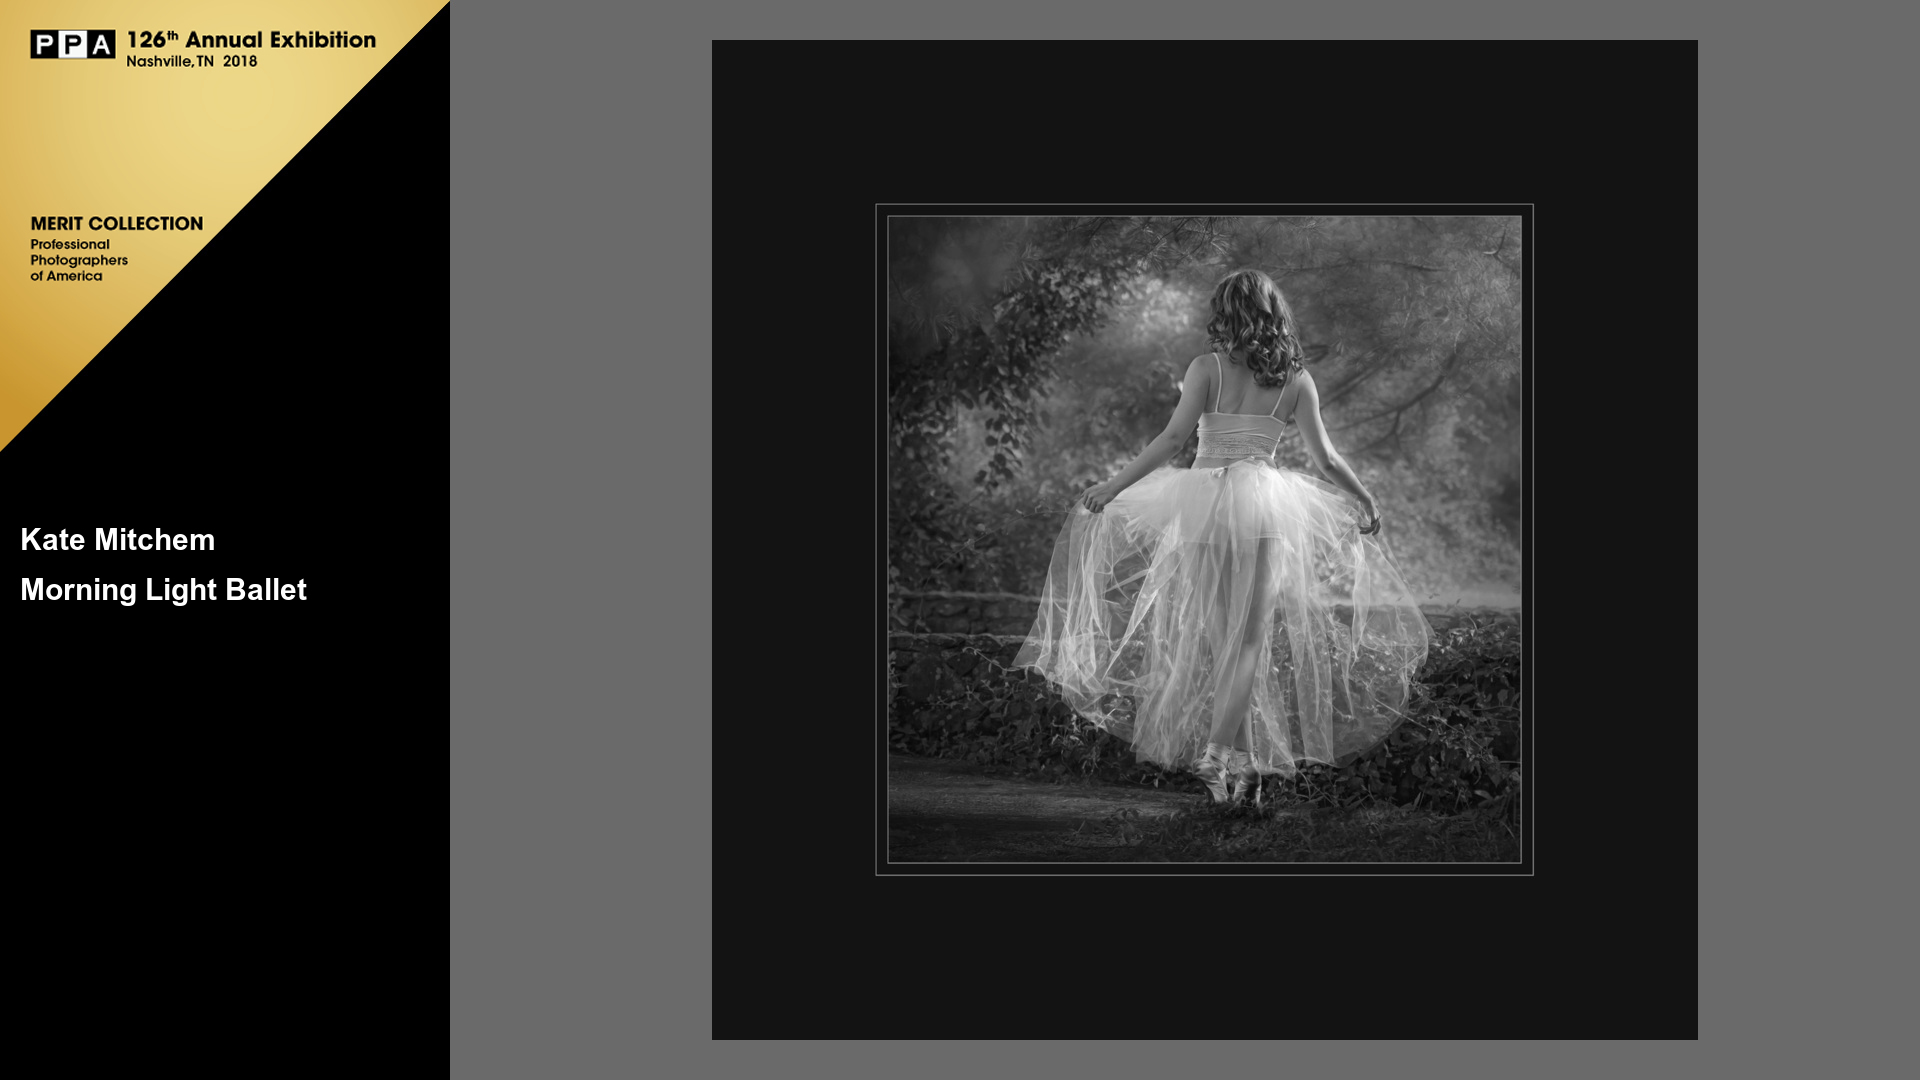 2017 Professional Photographer's Association Judging received Merit Award!